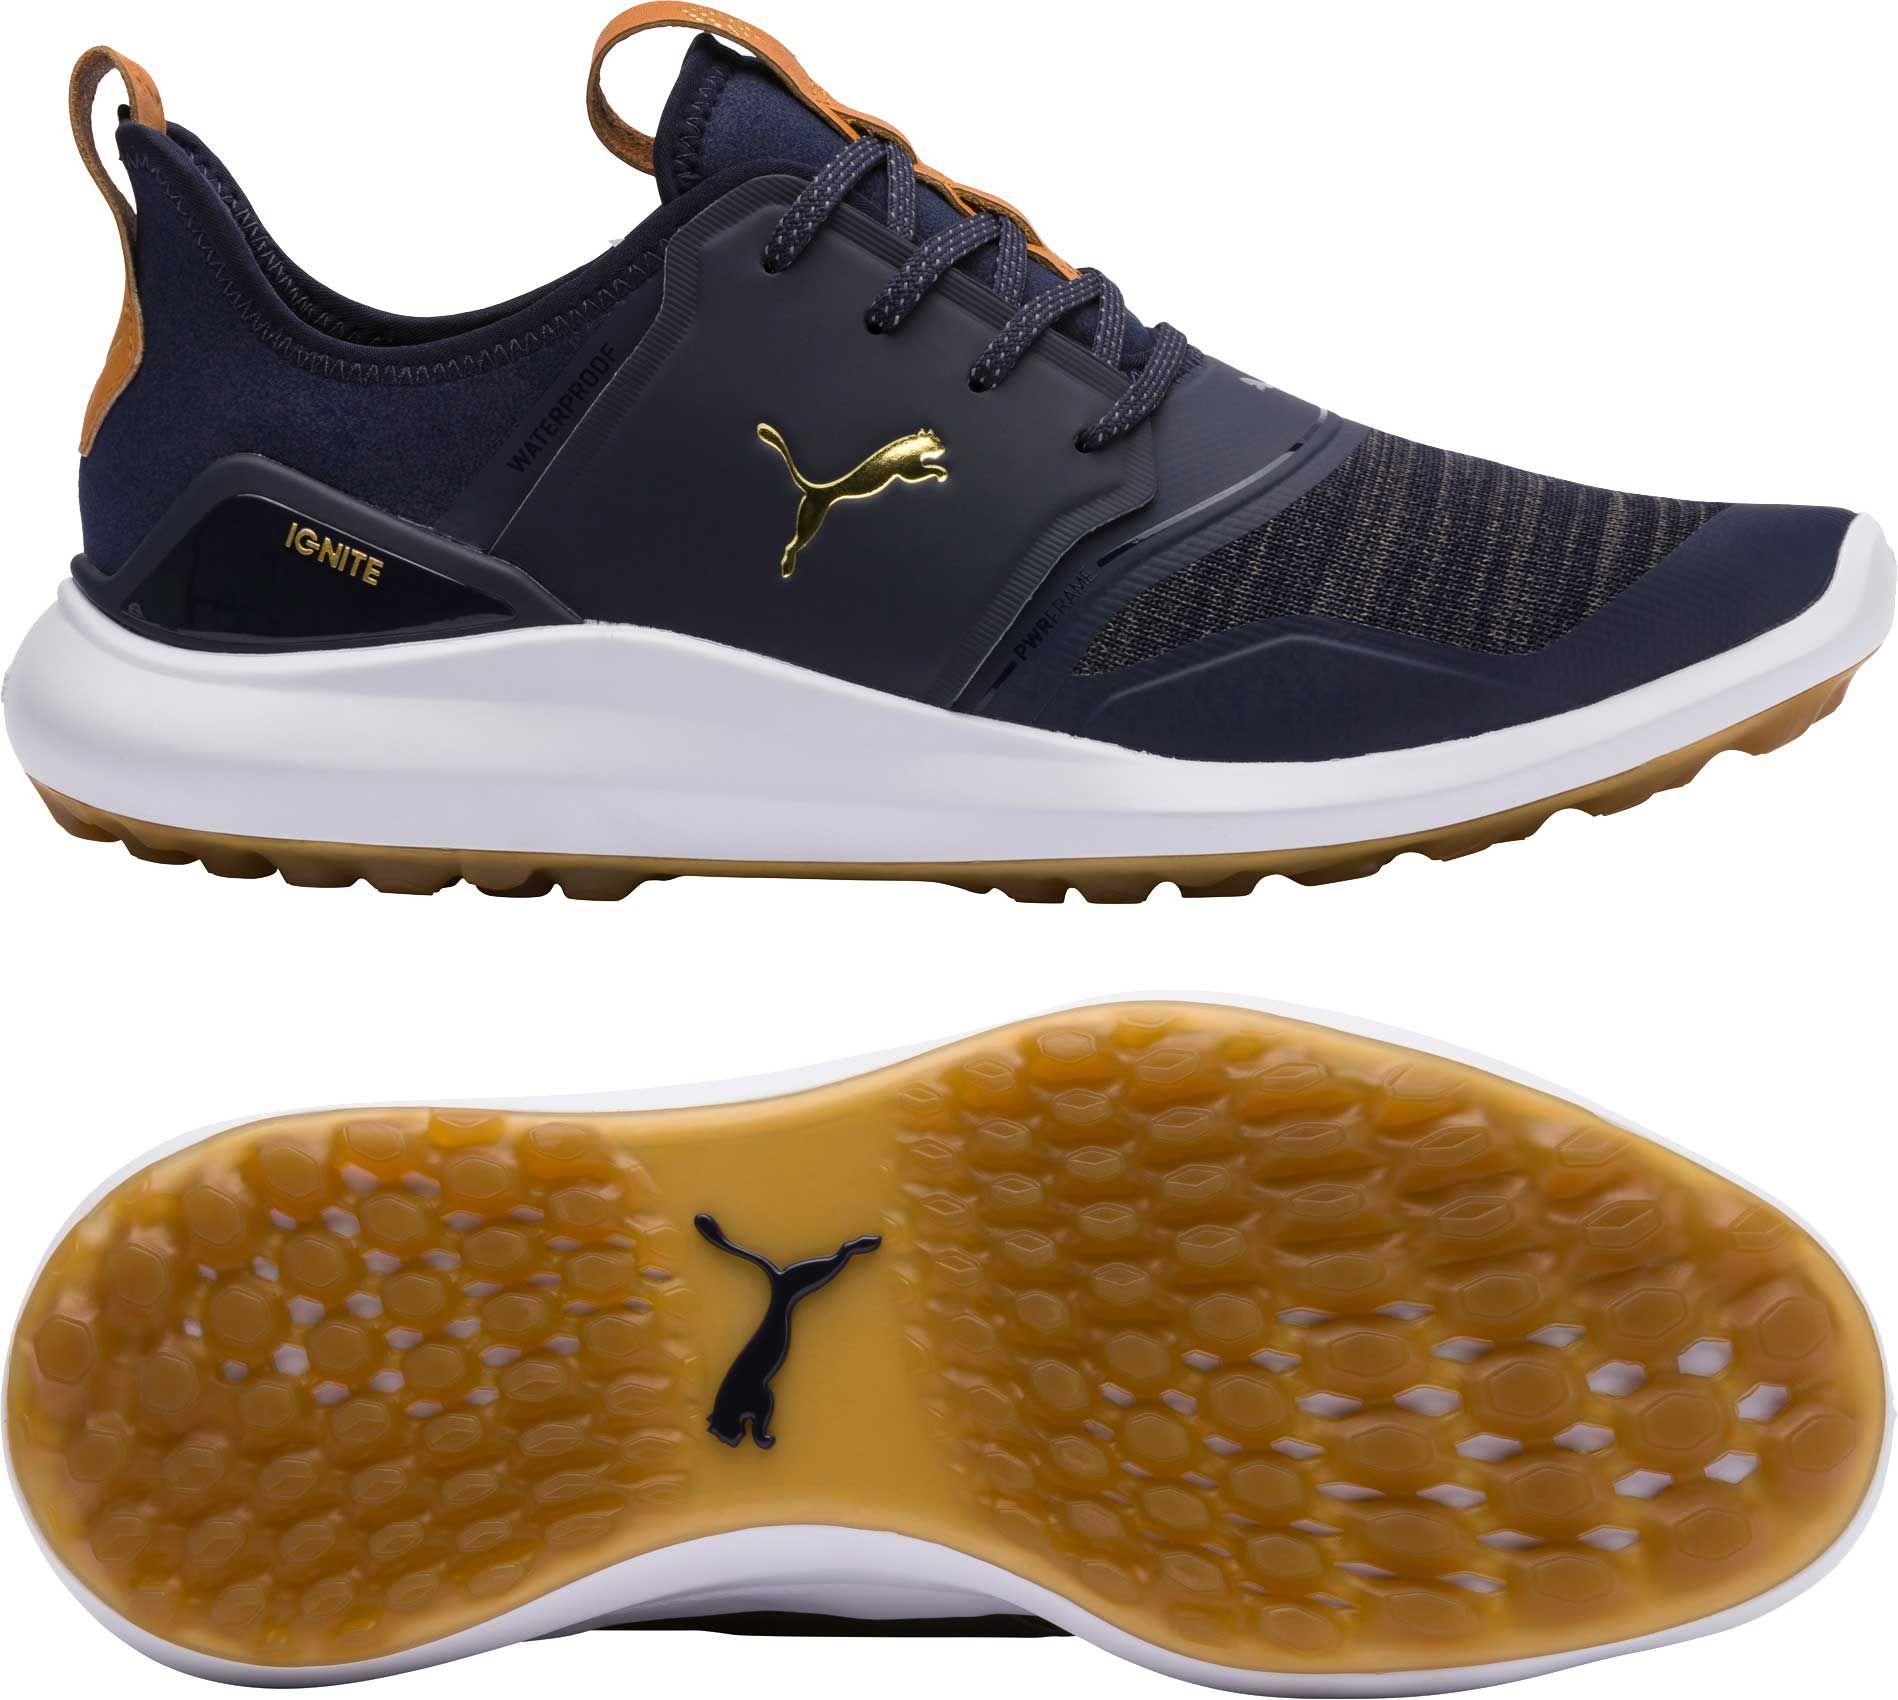 304aa9ed238 Reebok Driftium Run Men s Running Shoes in 2019